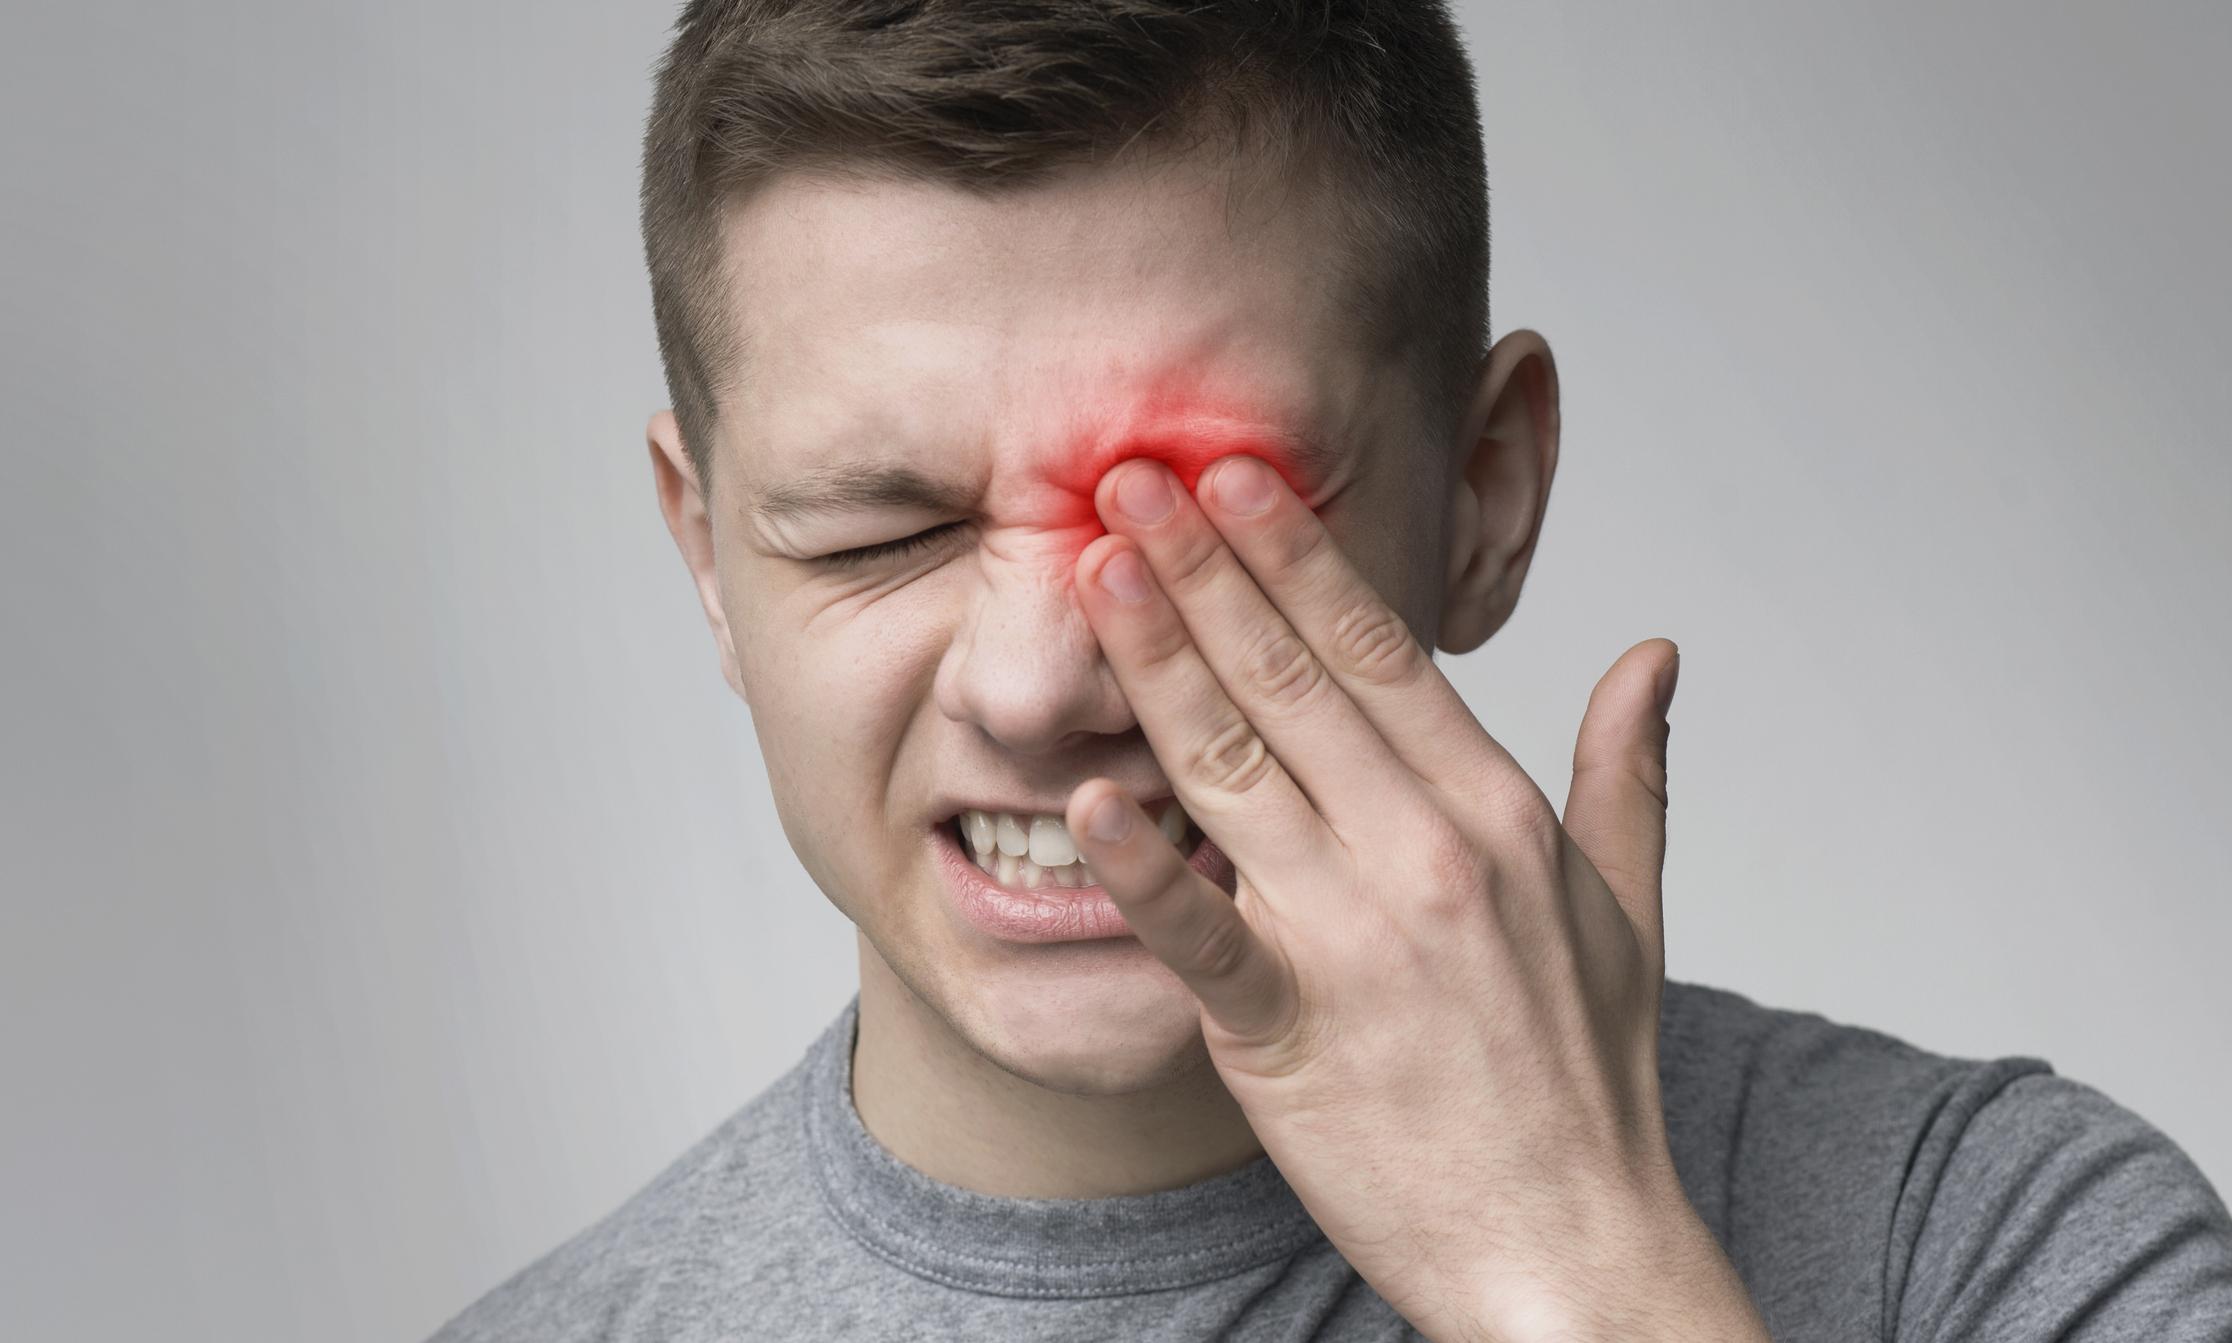 Stress schadet den Augen